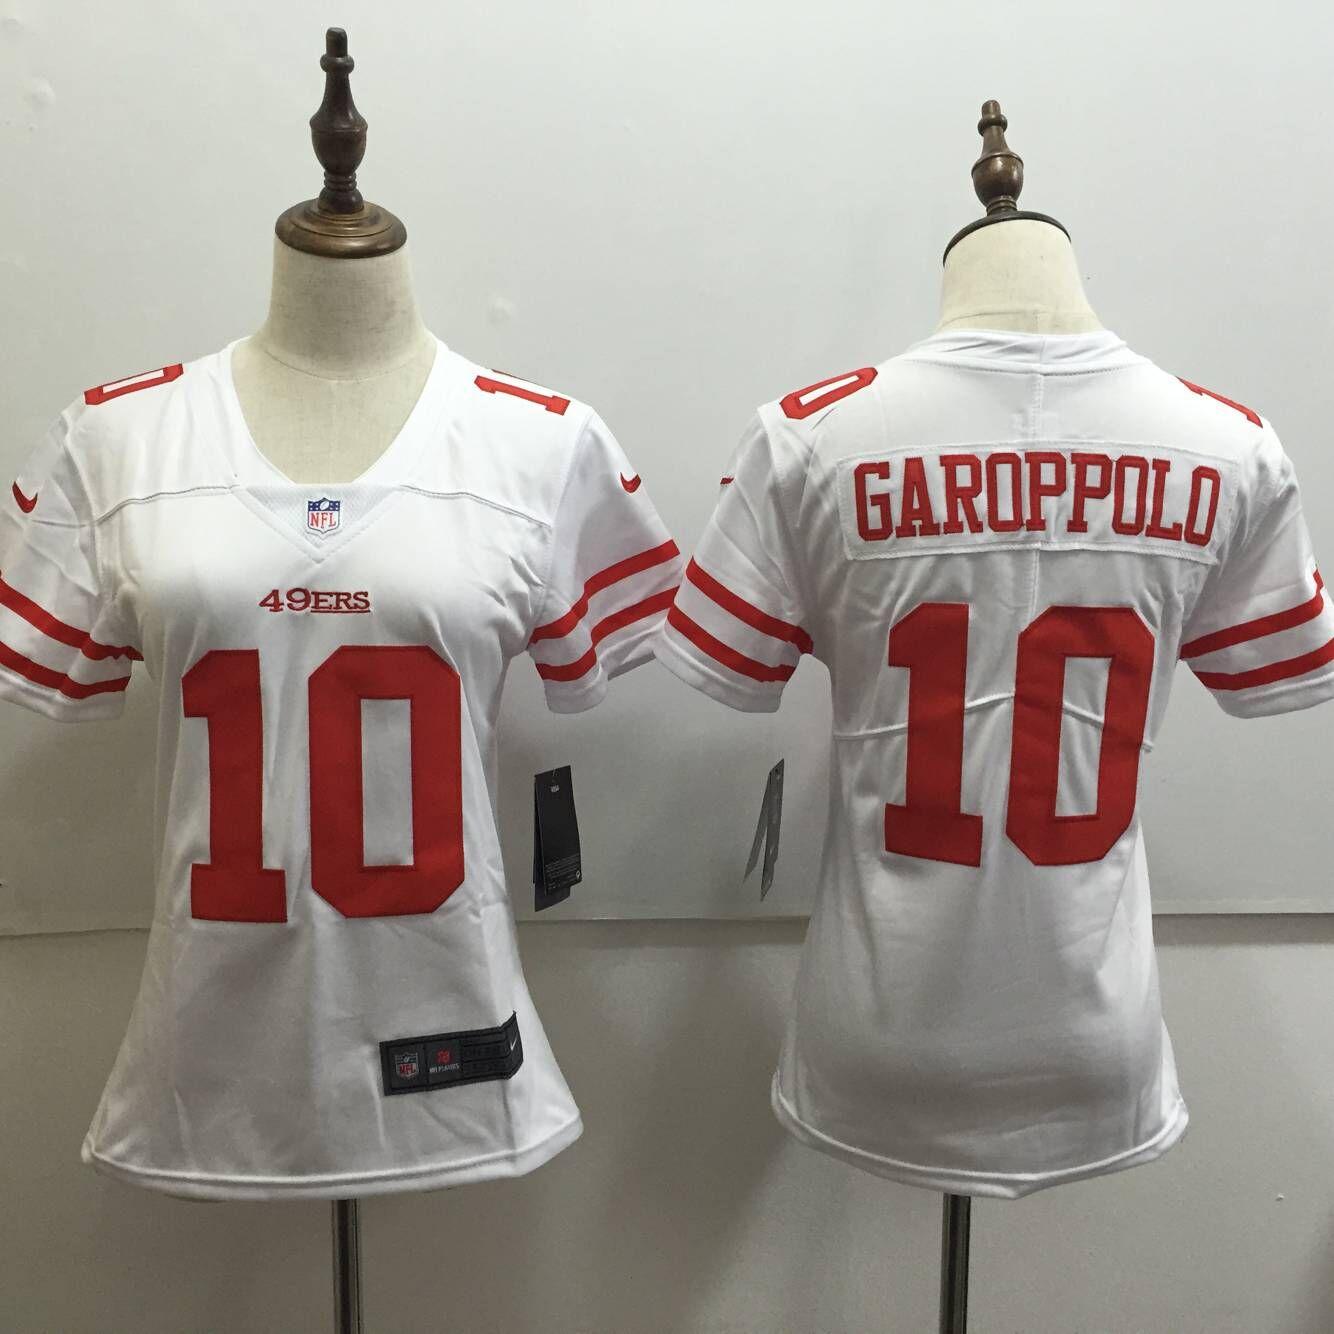 new product f7caa f5d5e San Francisco 49ers : Sports Shop Online